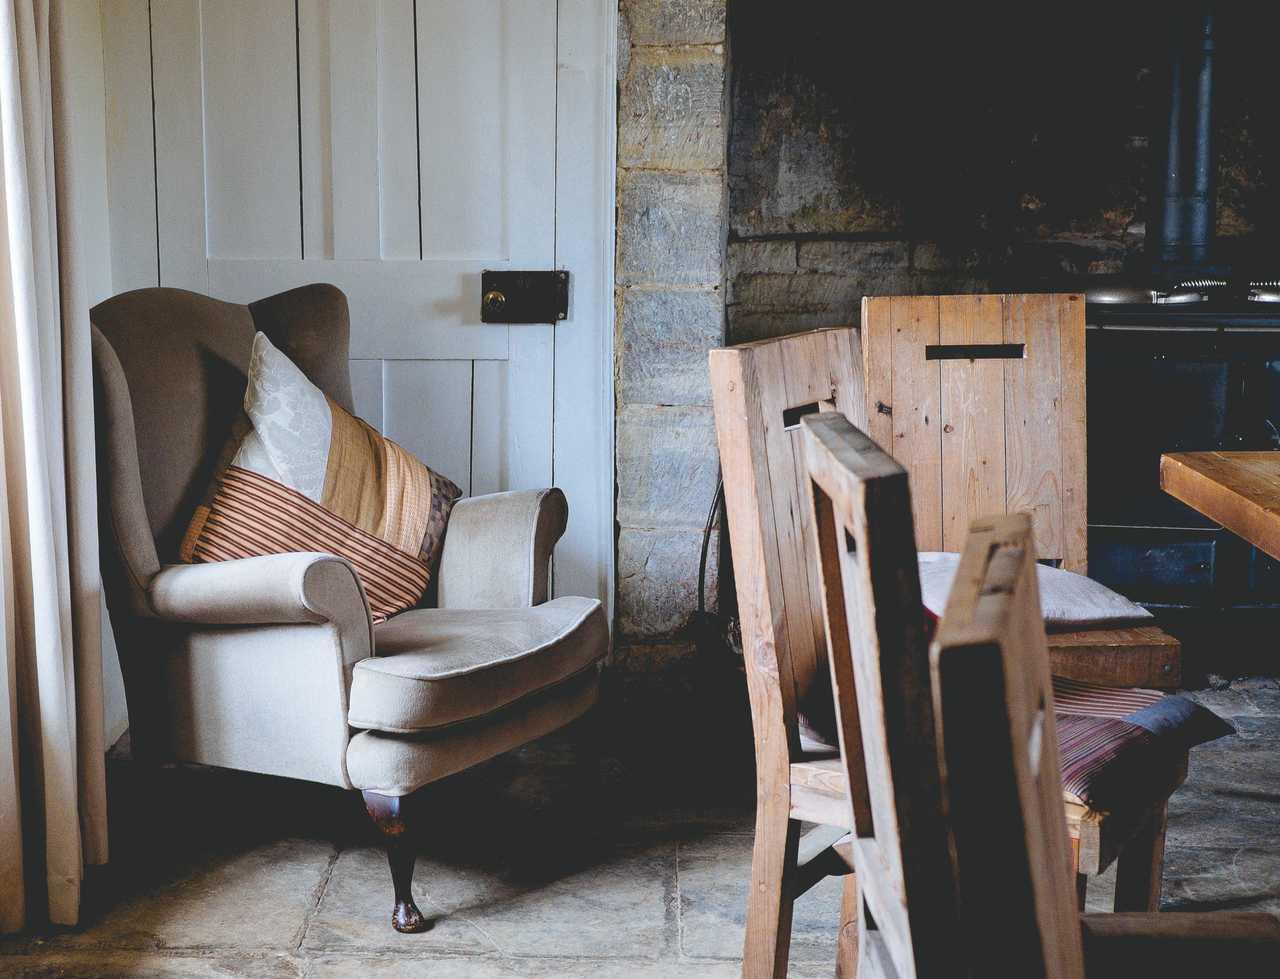 Comfort Plus Furniture & Mattresses - Shopping - Furniture in Waterloo ON